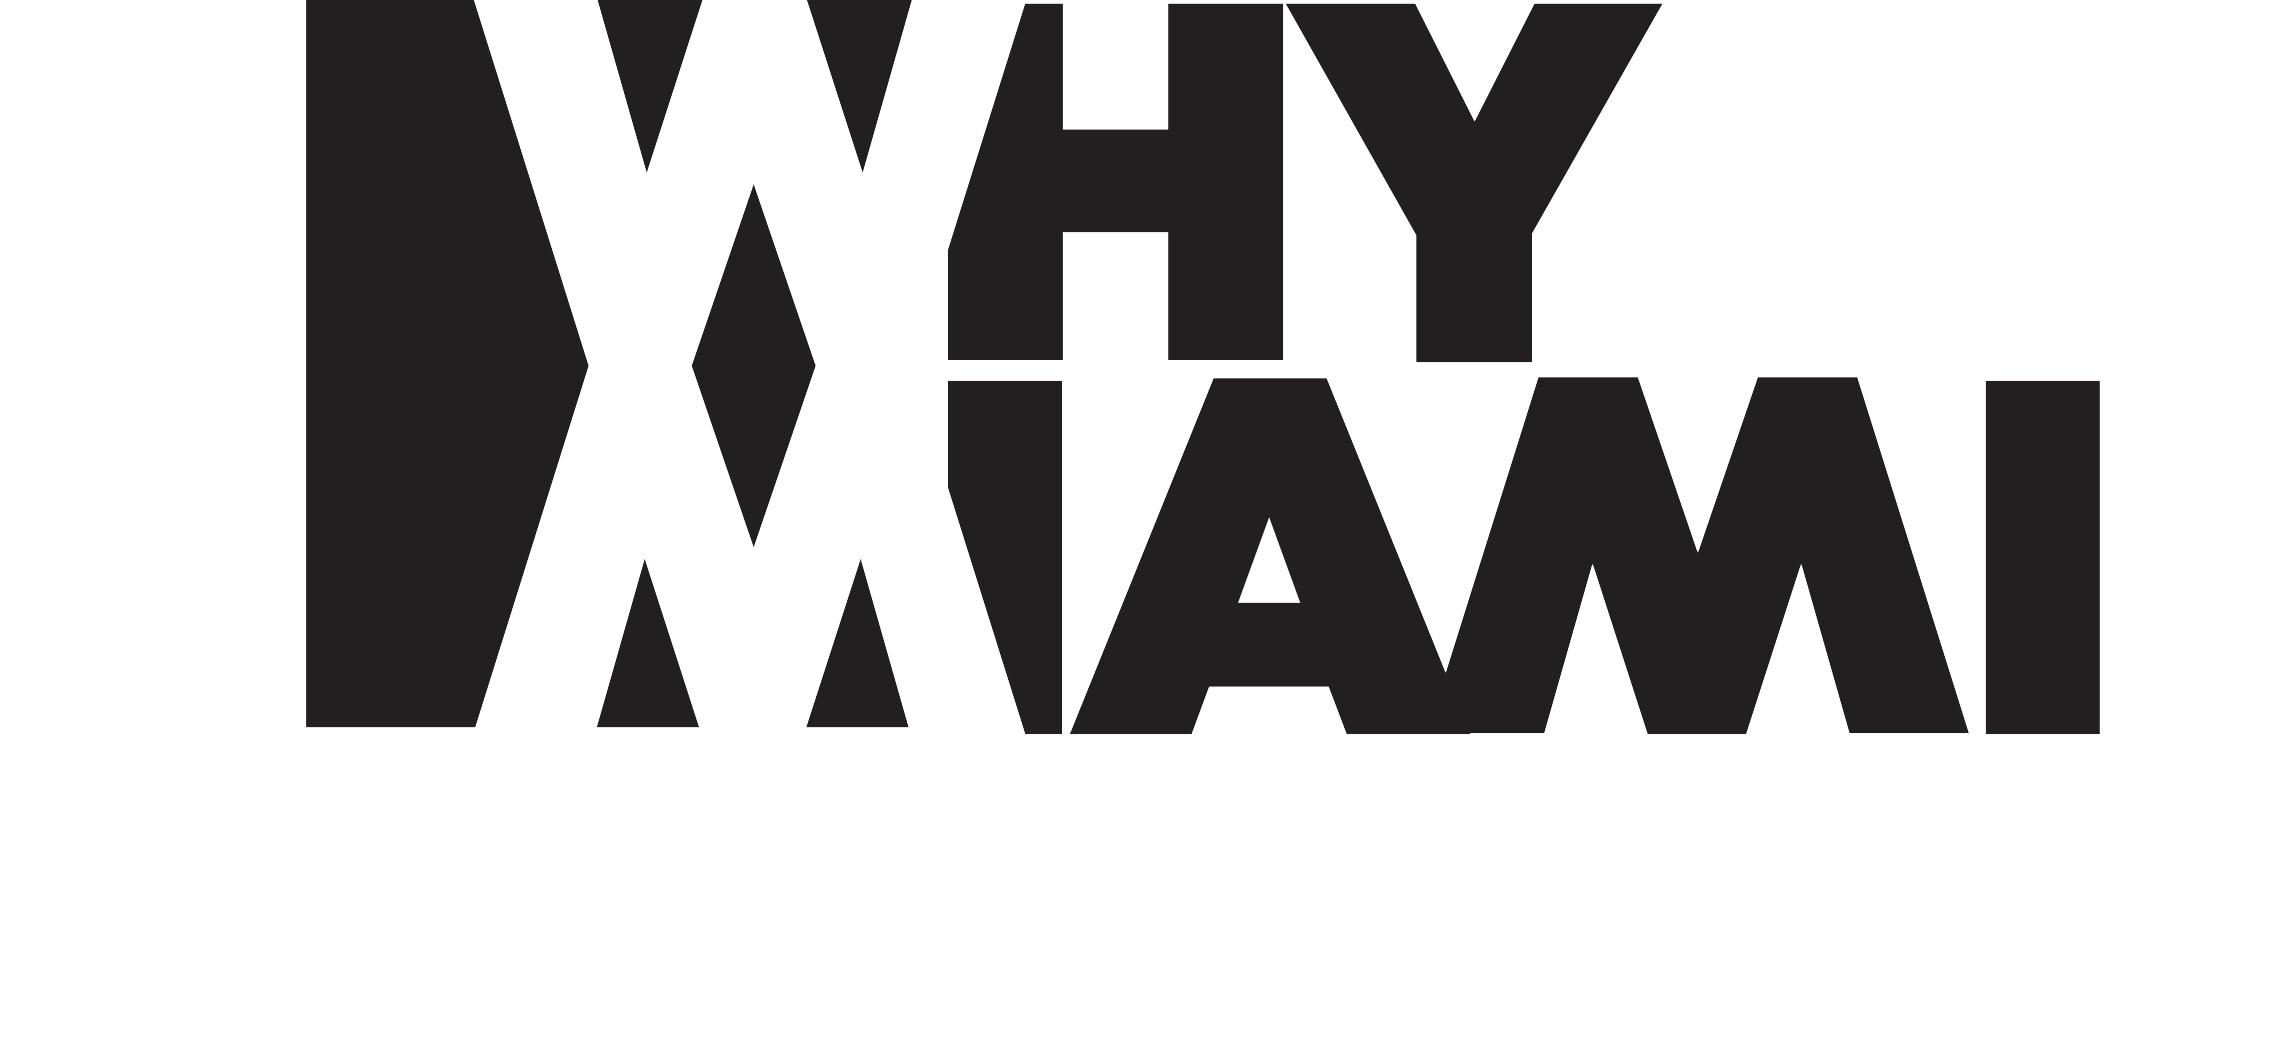 Why Miami logo.jpg